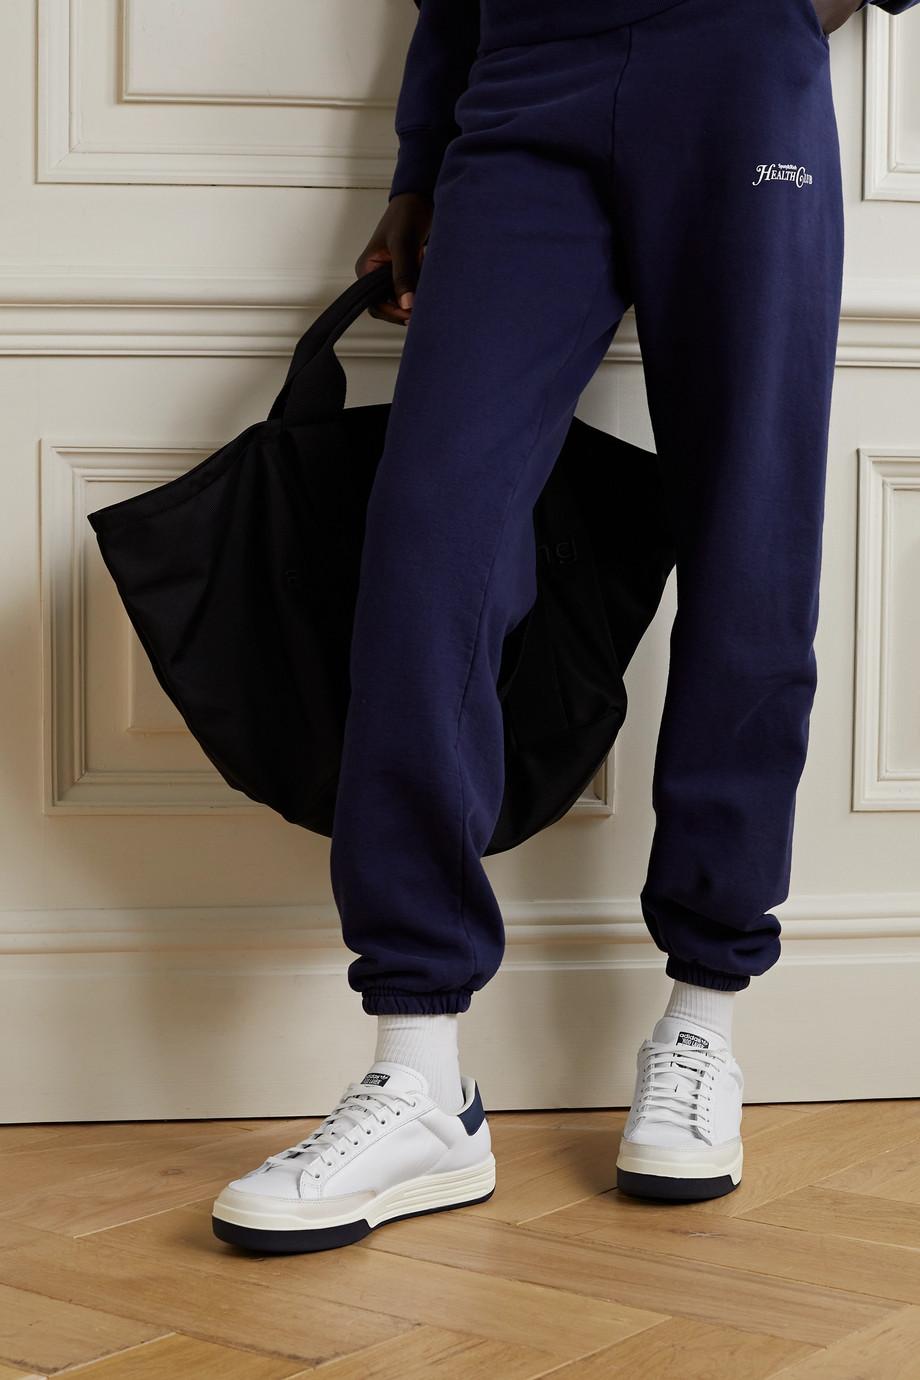 adidas Originals Rod Laver leather sneakers